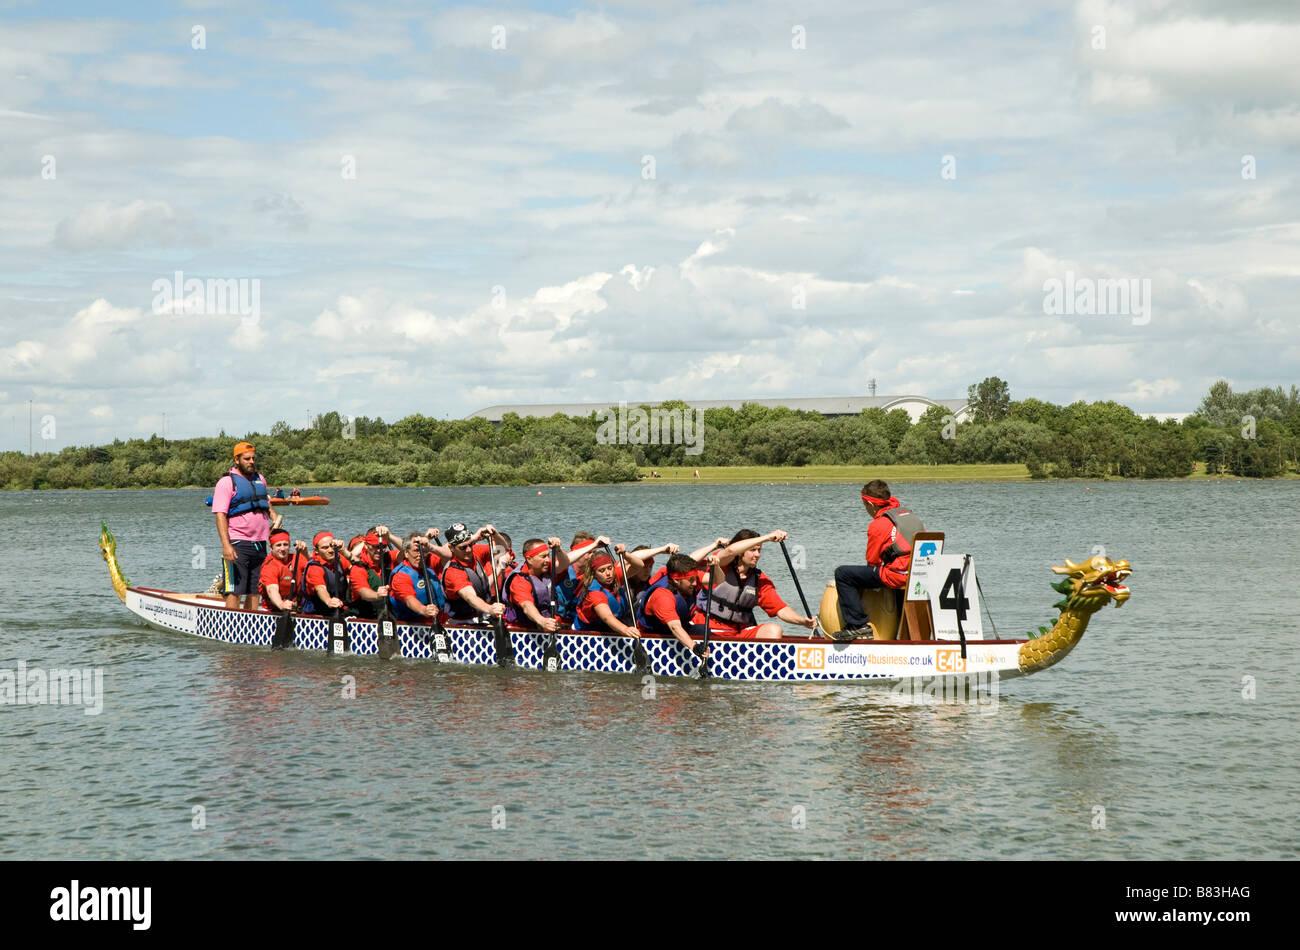 Dragon boat racing in Milton Keynes - Stock Image